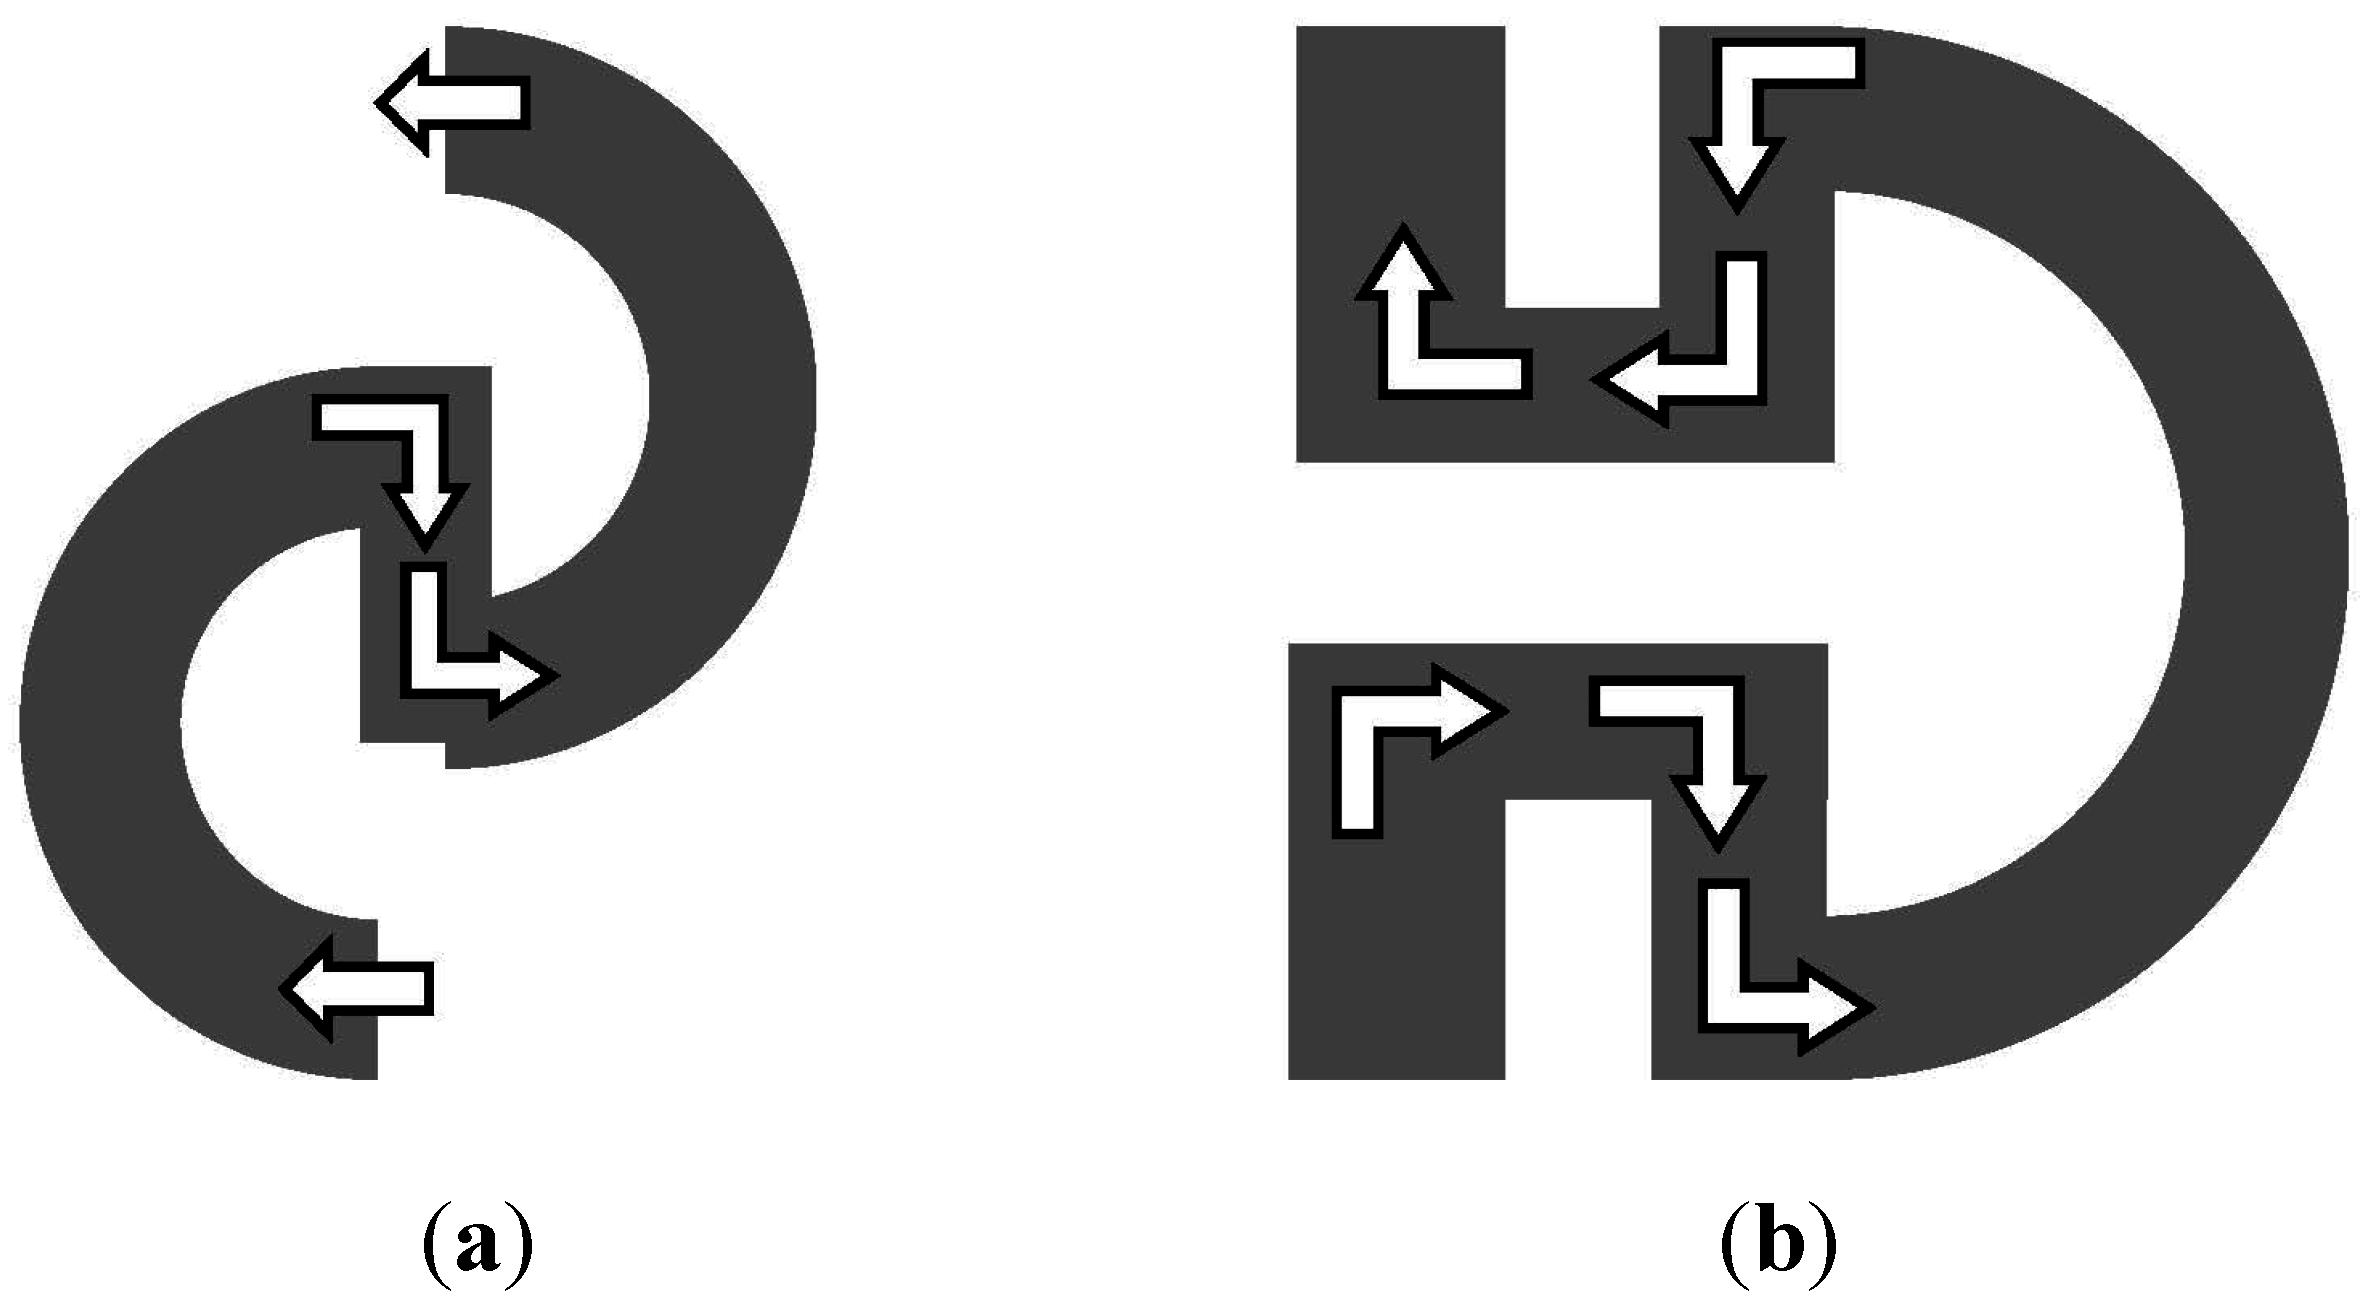 Trane xe90 wiring diagram pdf trane xe70 wiring diagram for Trane xe90 blower motor